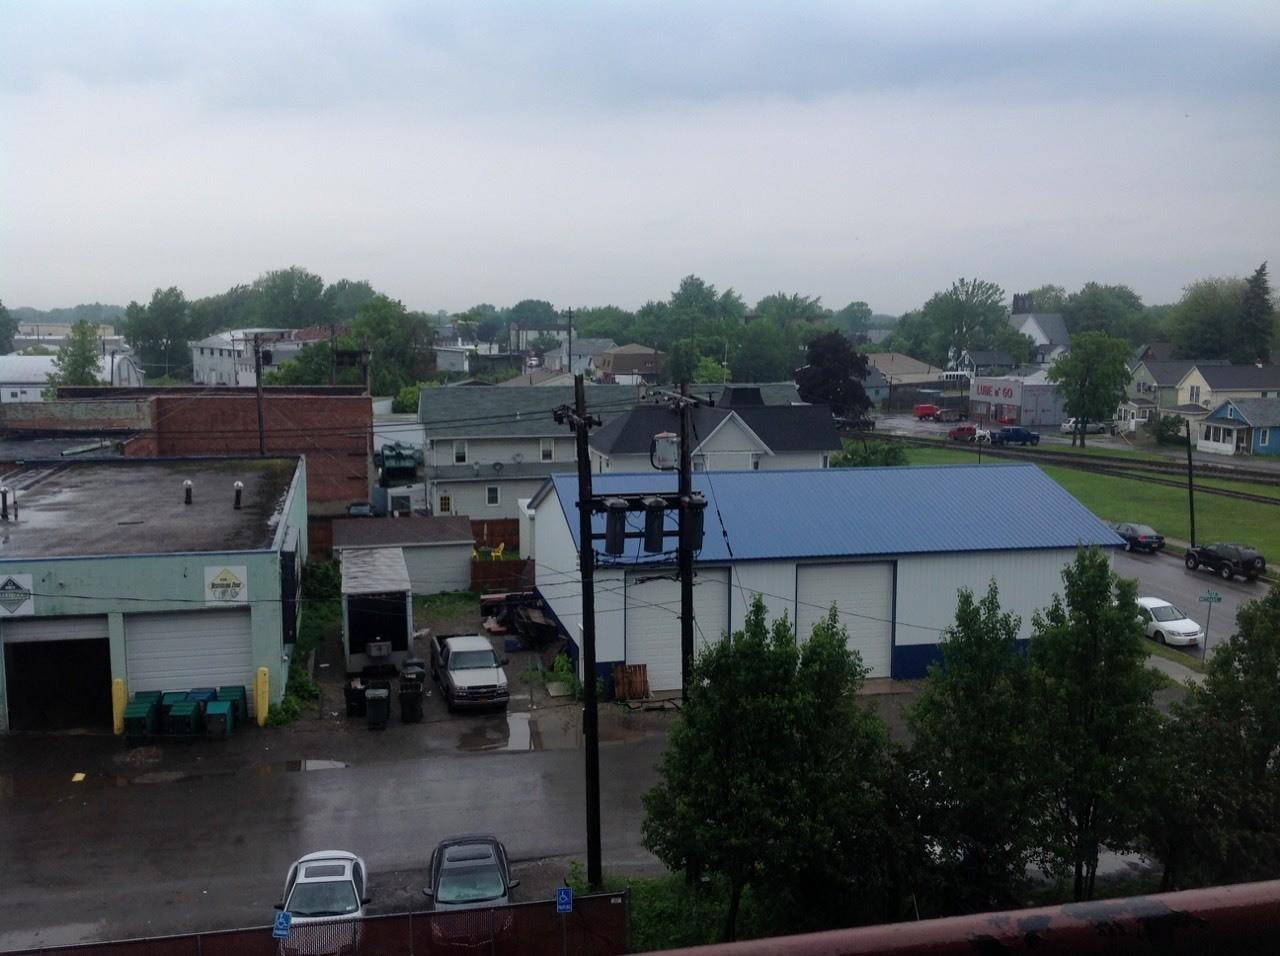 It stopped raining in North tonawanda